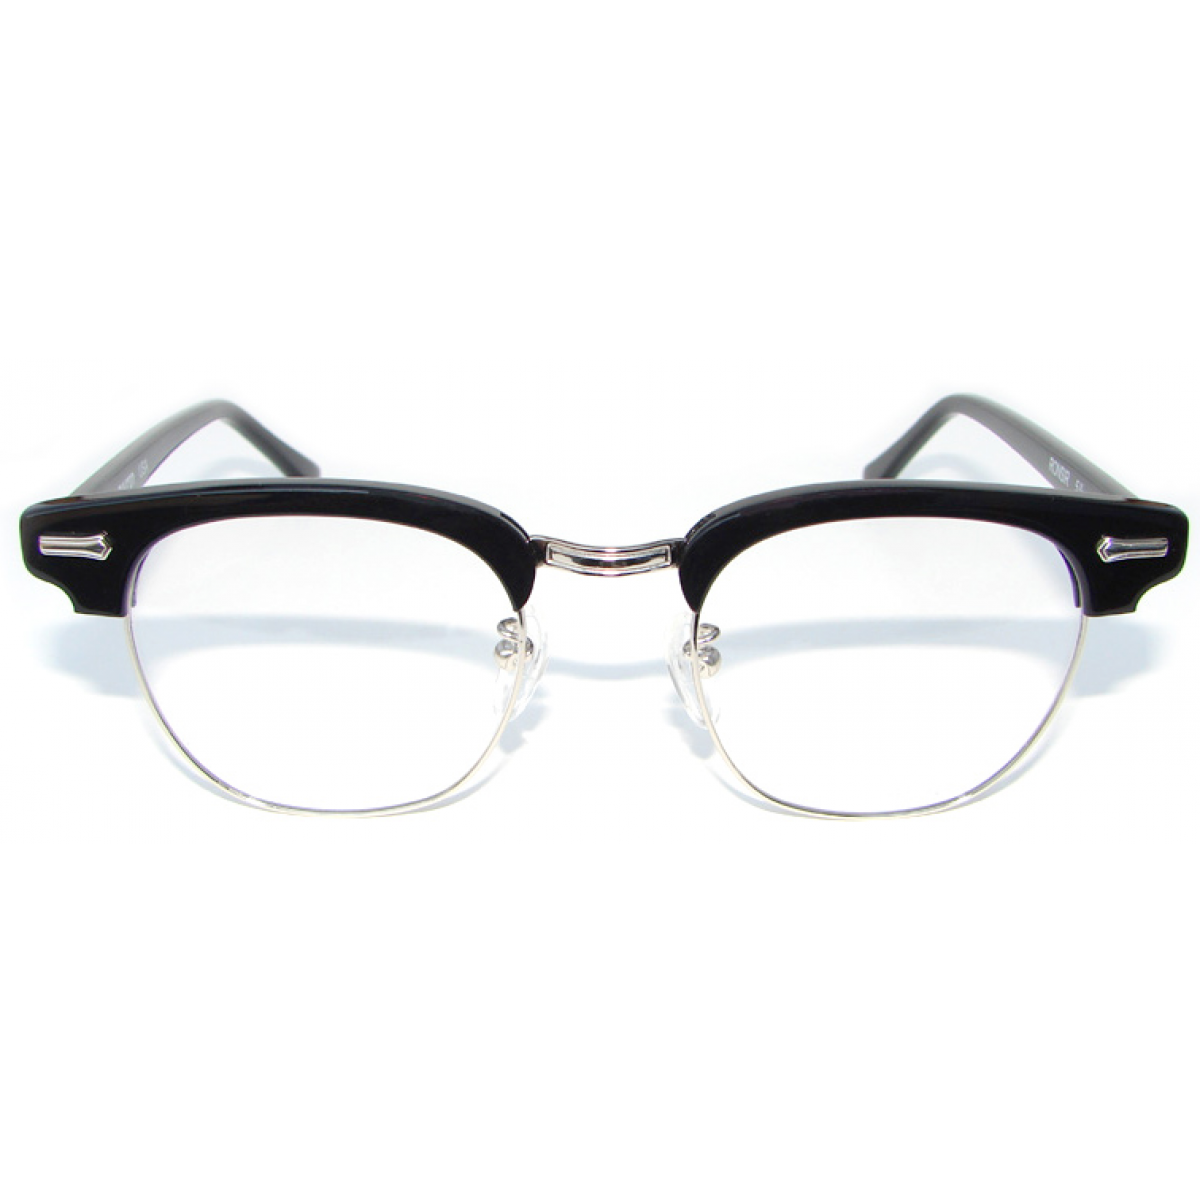 d1ff9efd32 eyeglass.com-Ronsir Classic Clubmaster Eyeglasses-34  SUNBANS ...